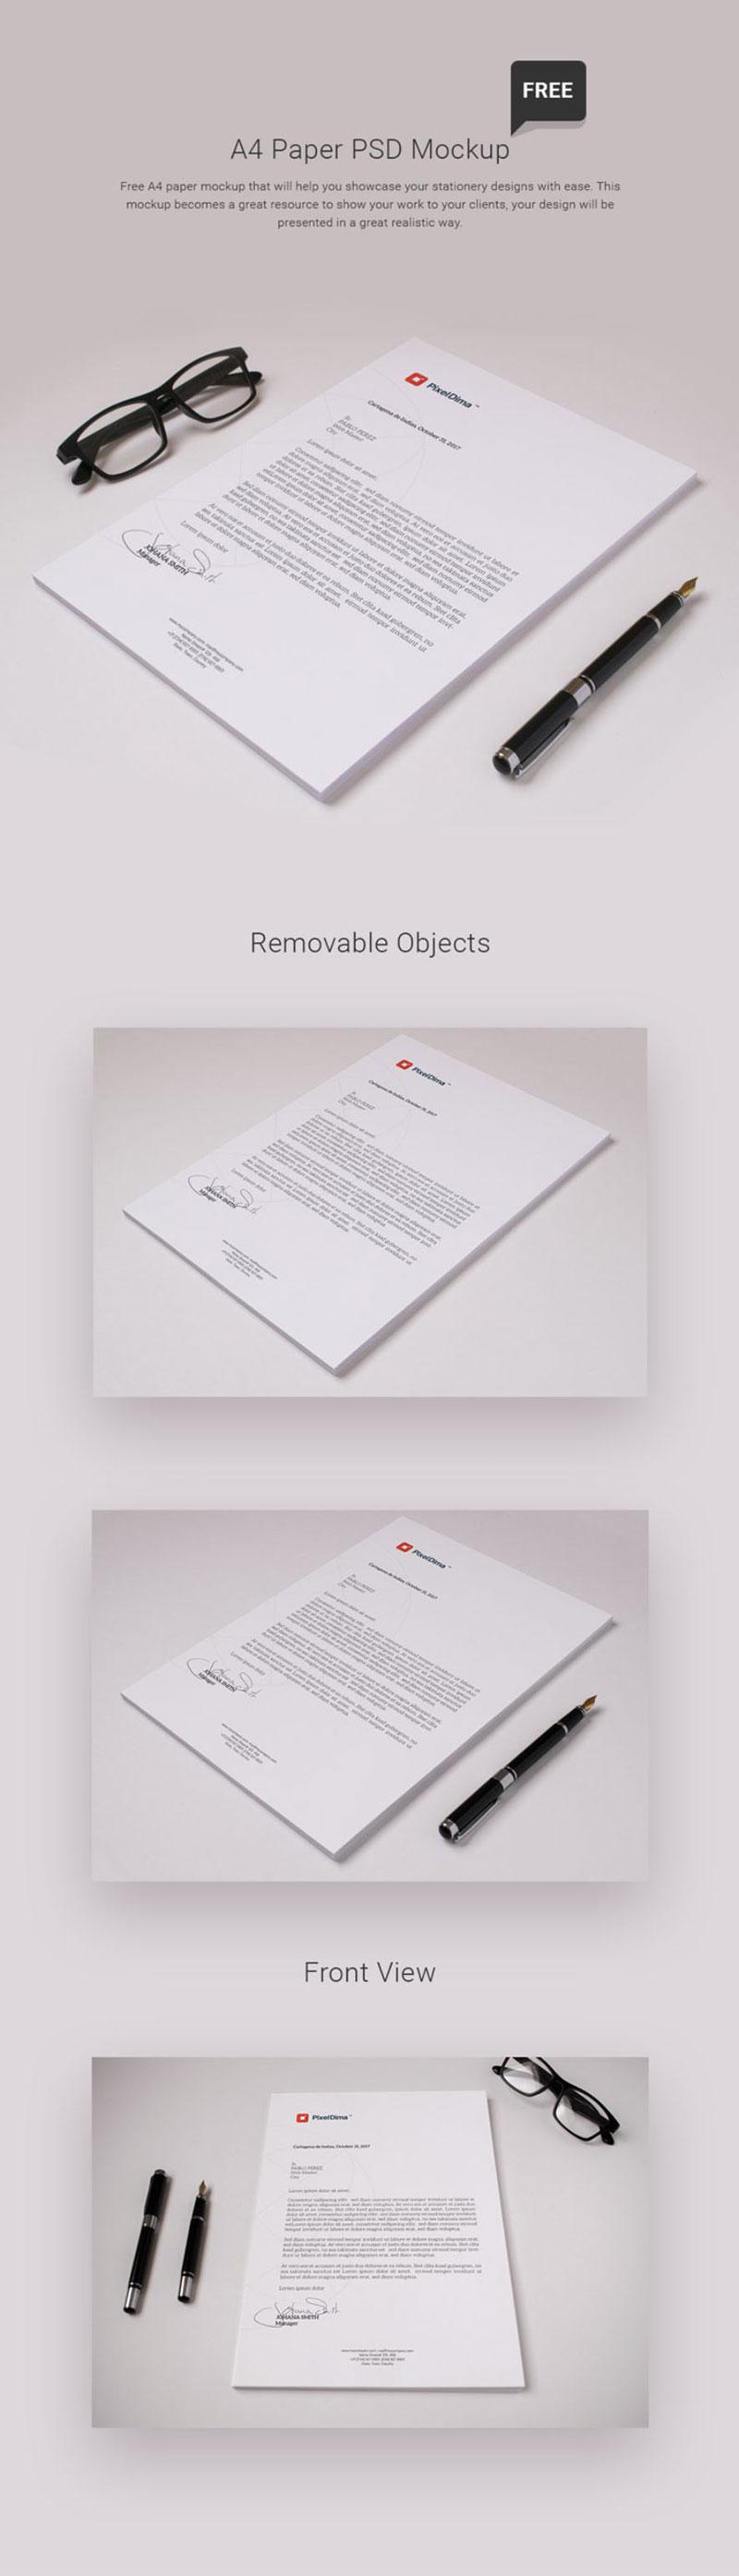 Free-A4-Paper-PSD-Mockup